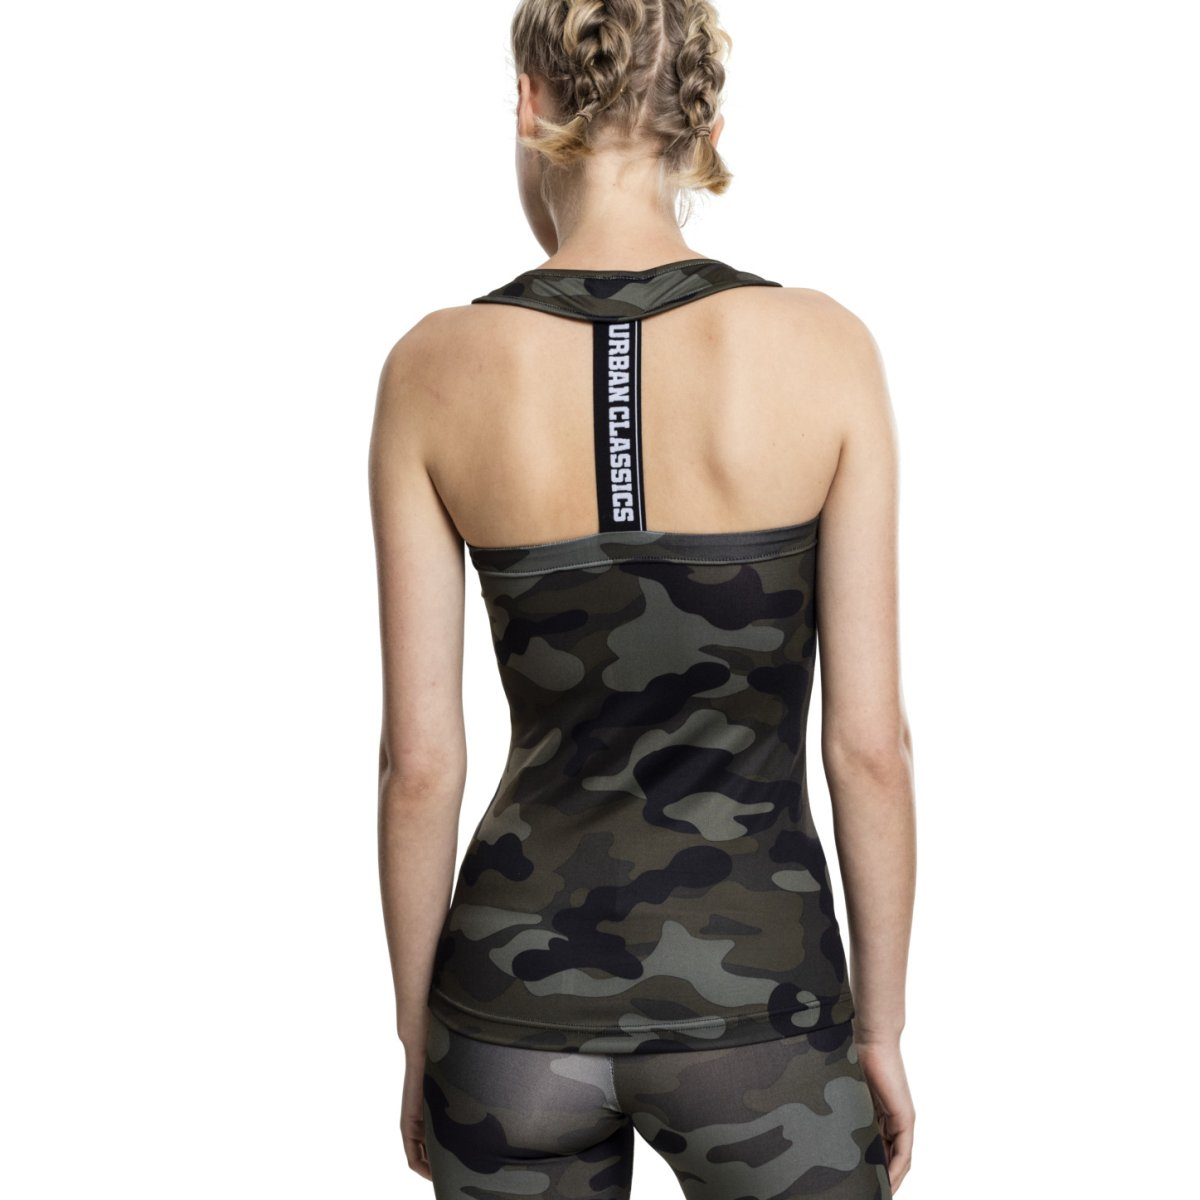 SPORTS Fitness Tank Top army camo Urban Classics Ladies